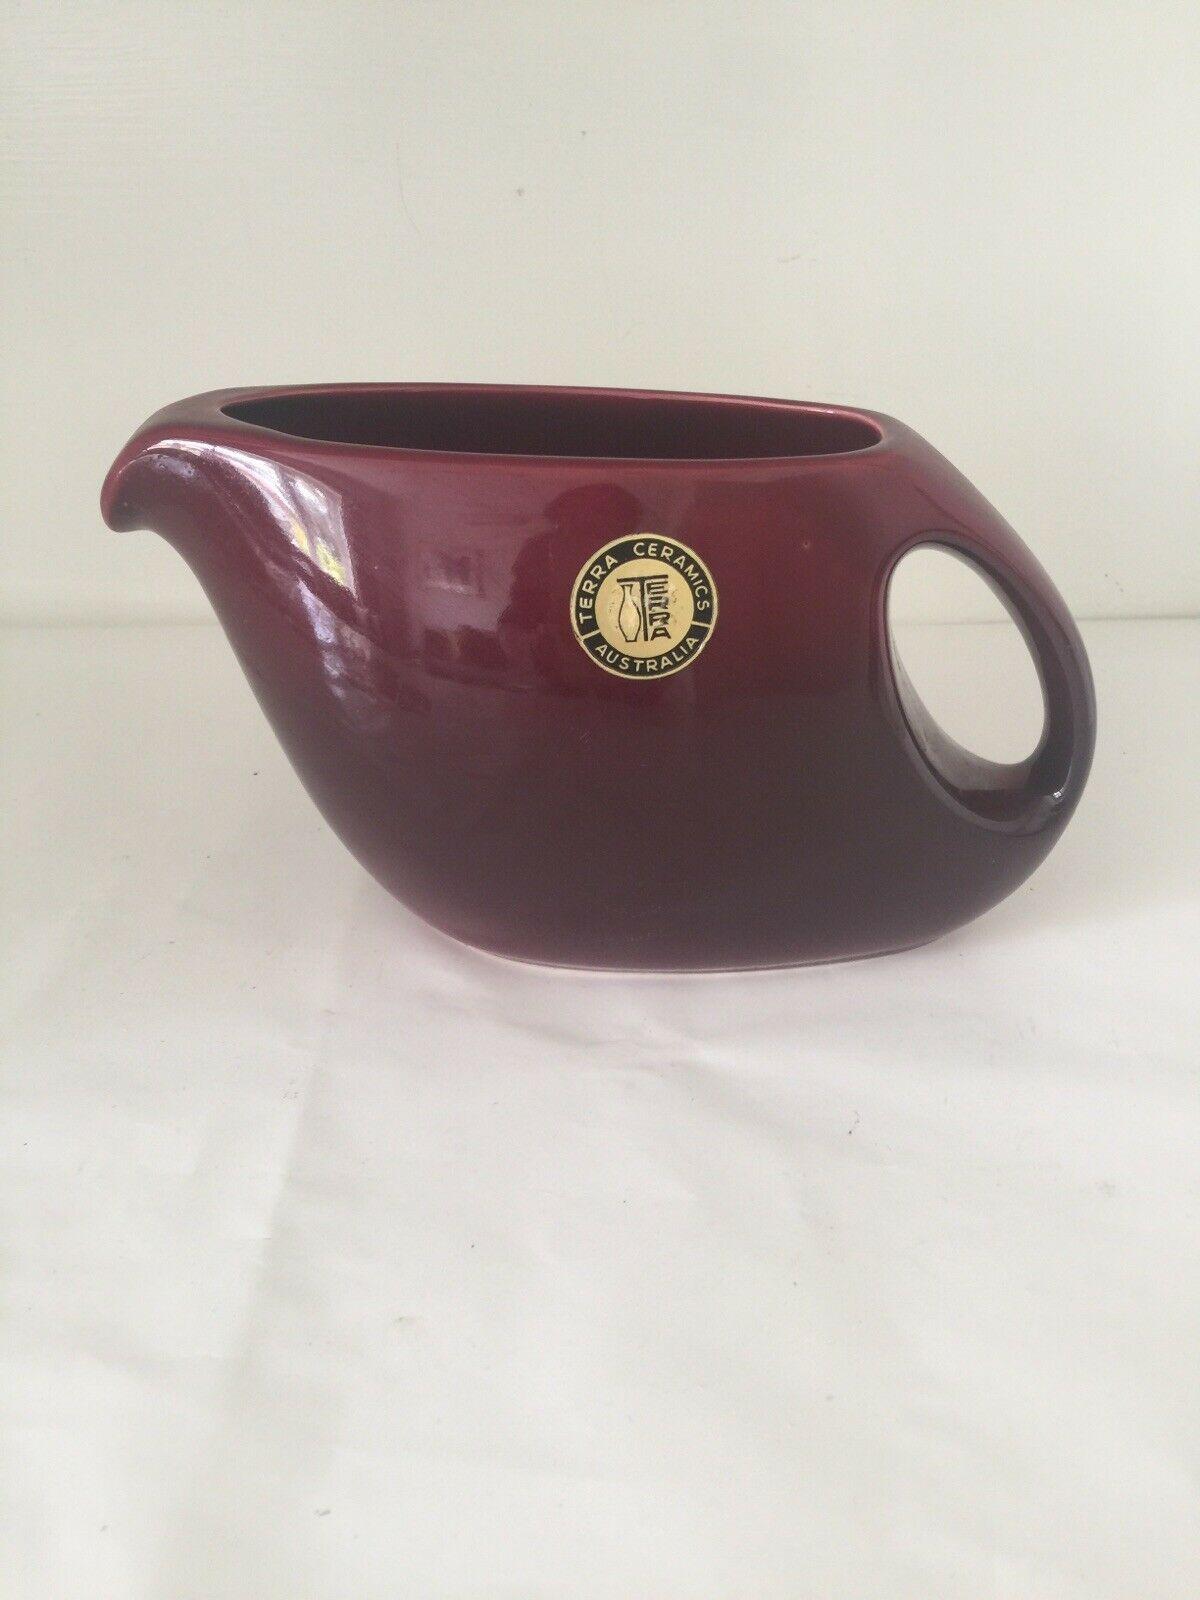 Terrra Ceramics Australia - Water Jug